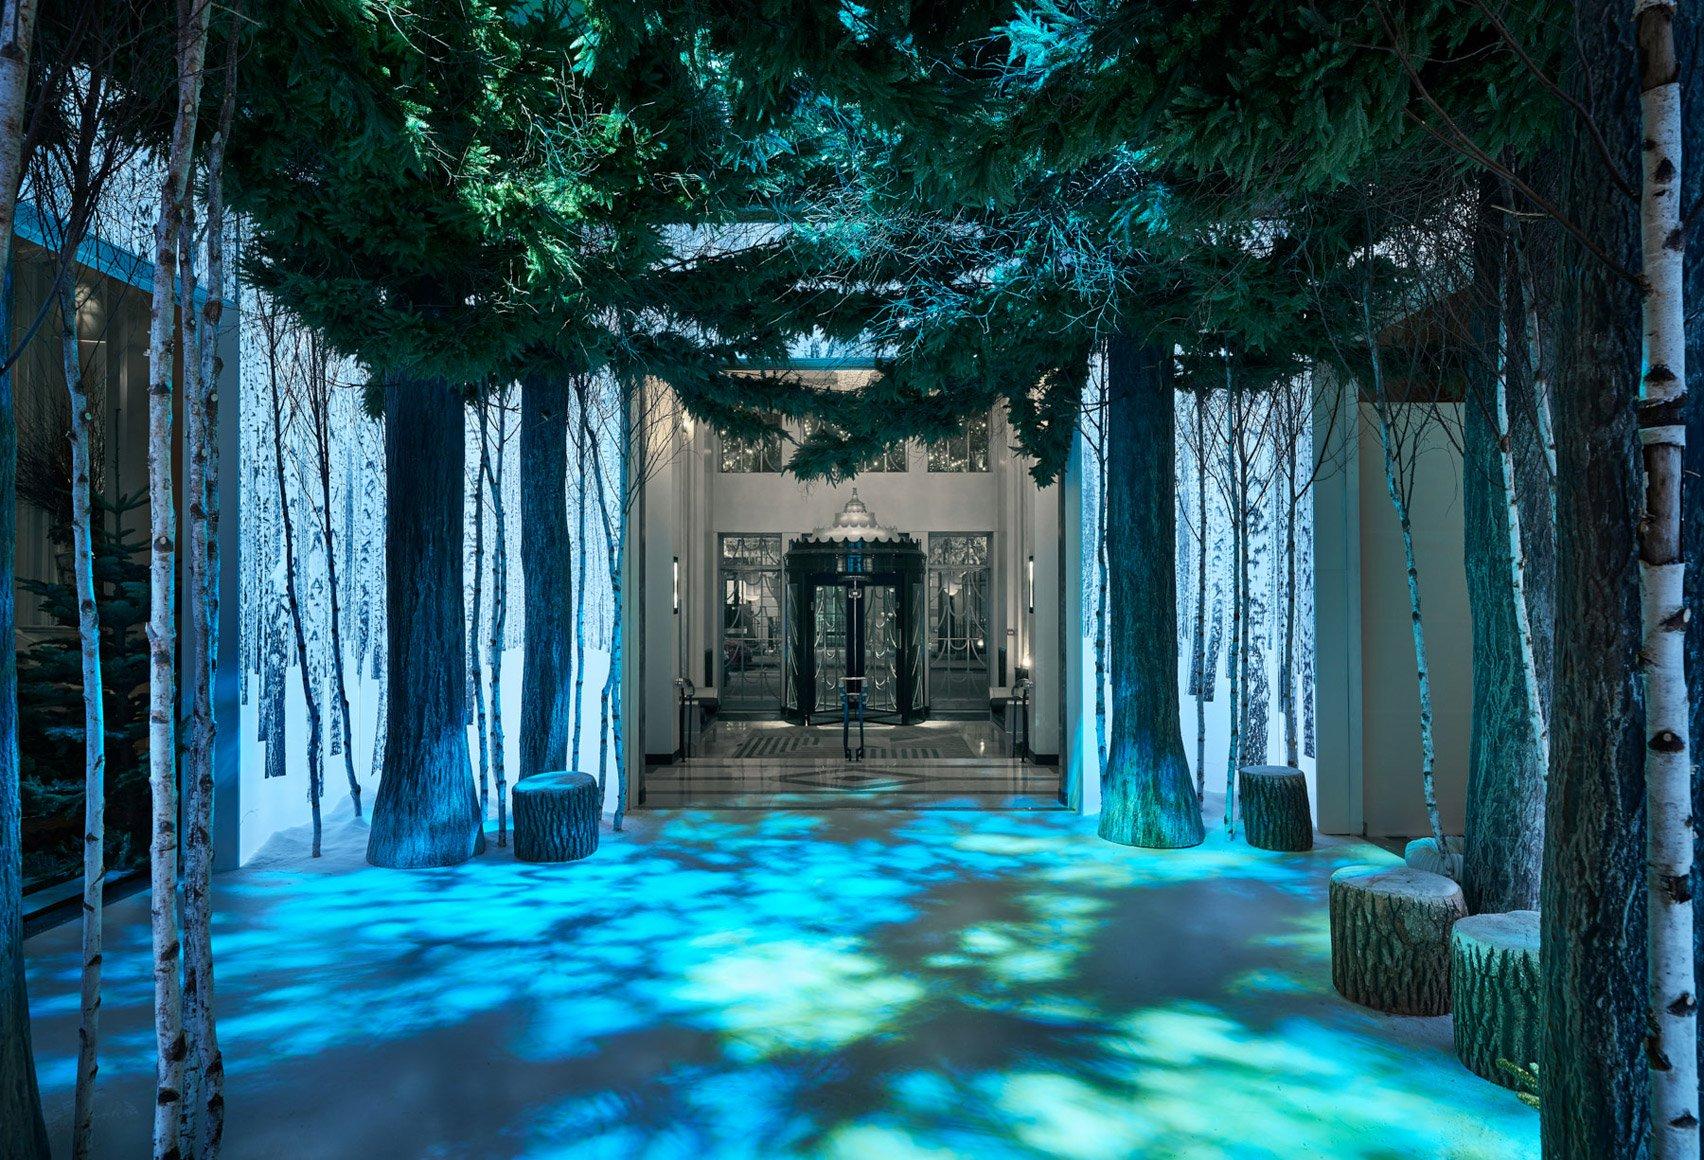 jony-ive-marc-newson-christmas-tree-design-claridges-london_dezeen_1704_col_7